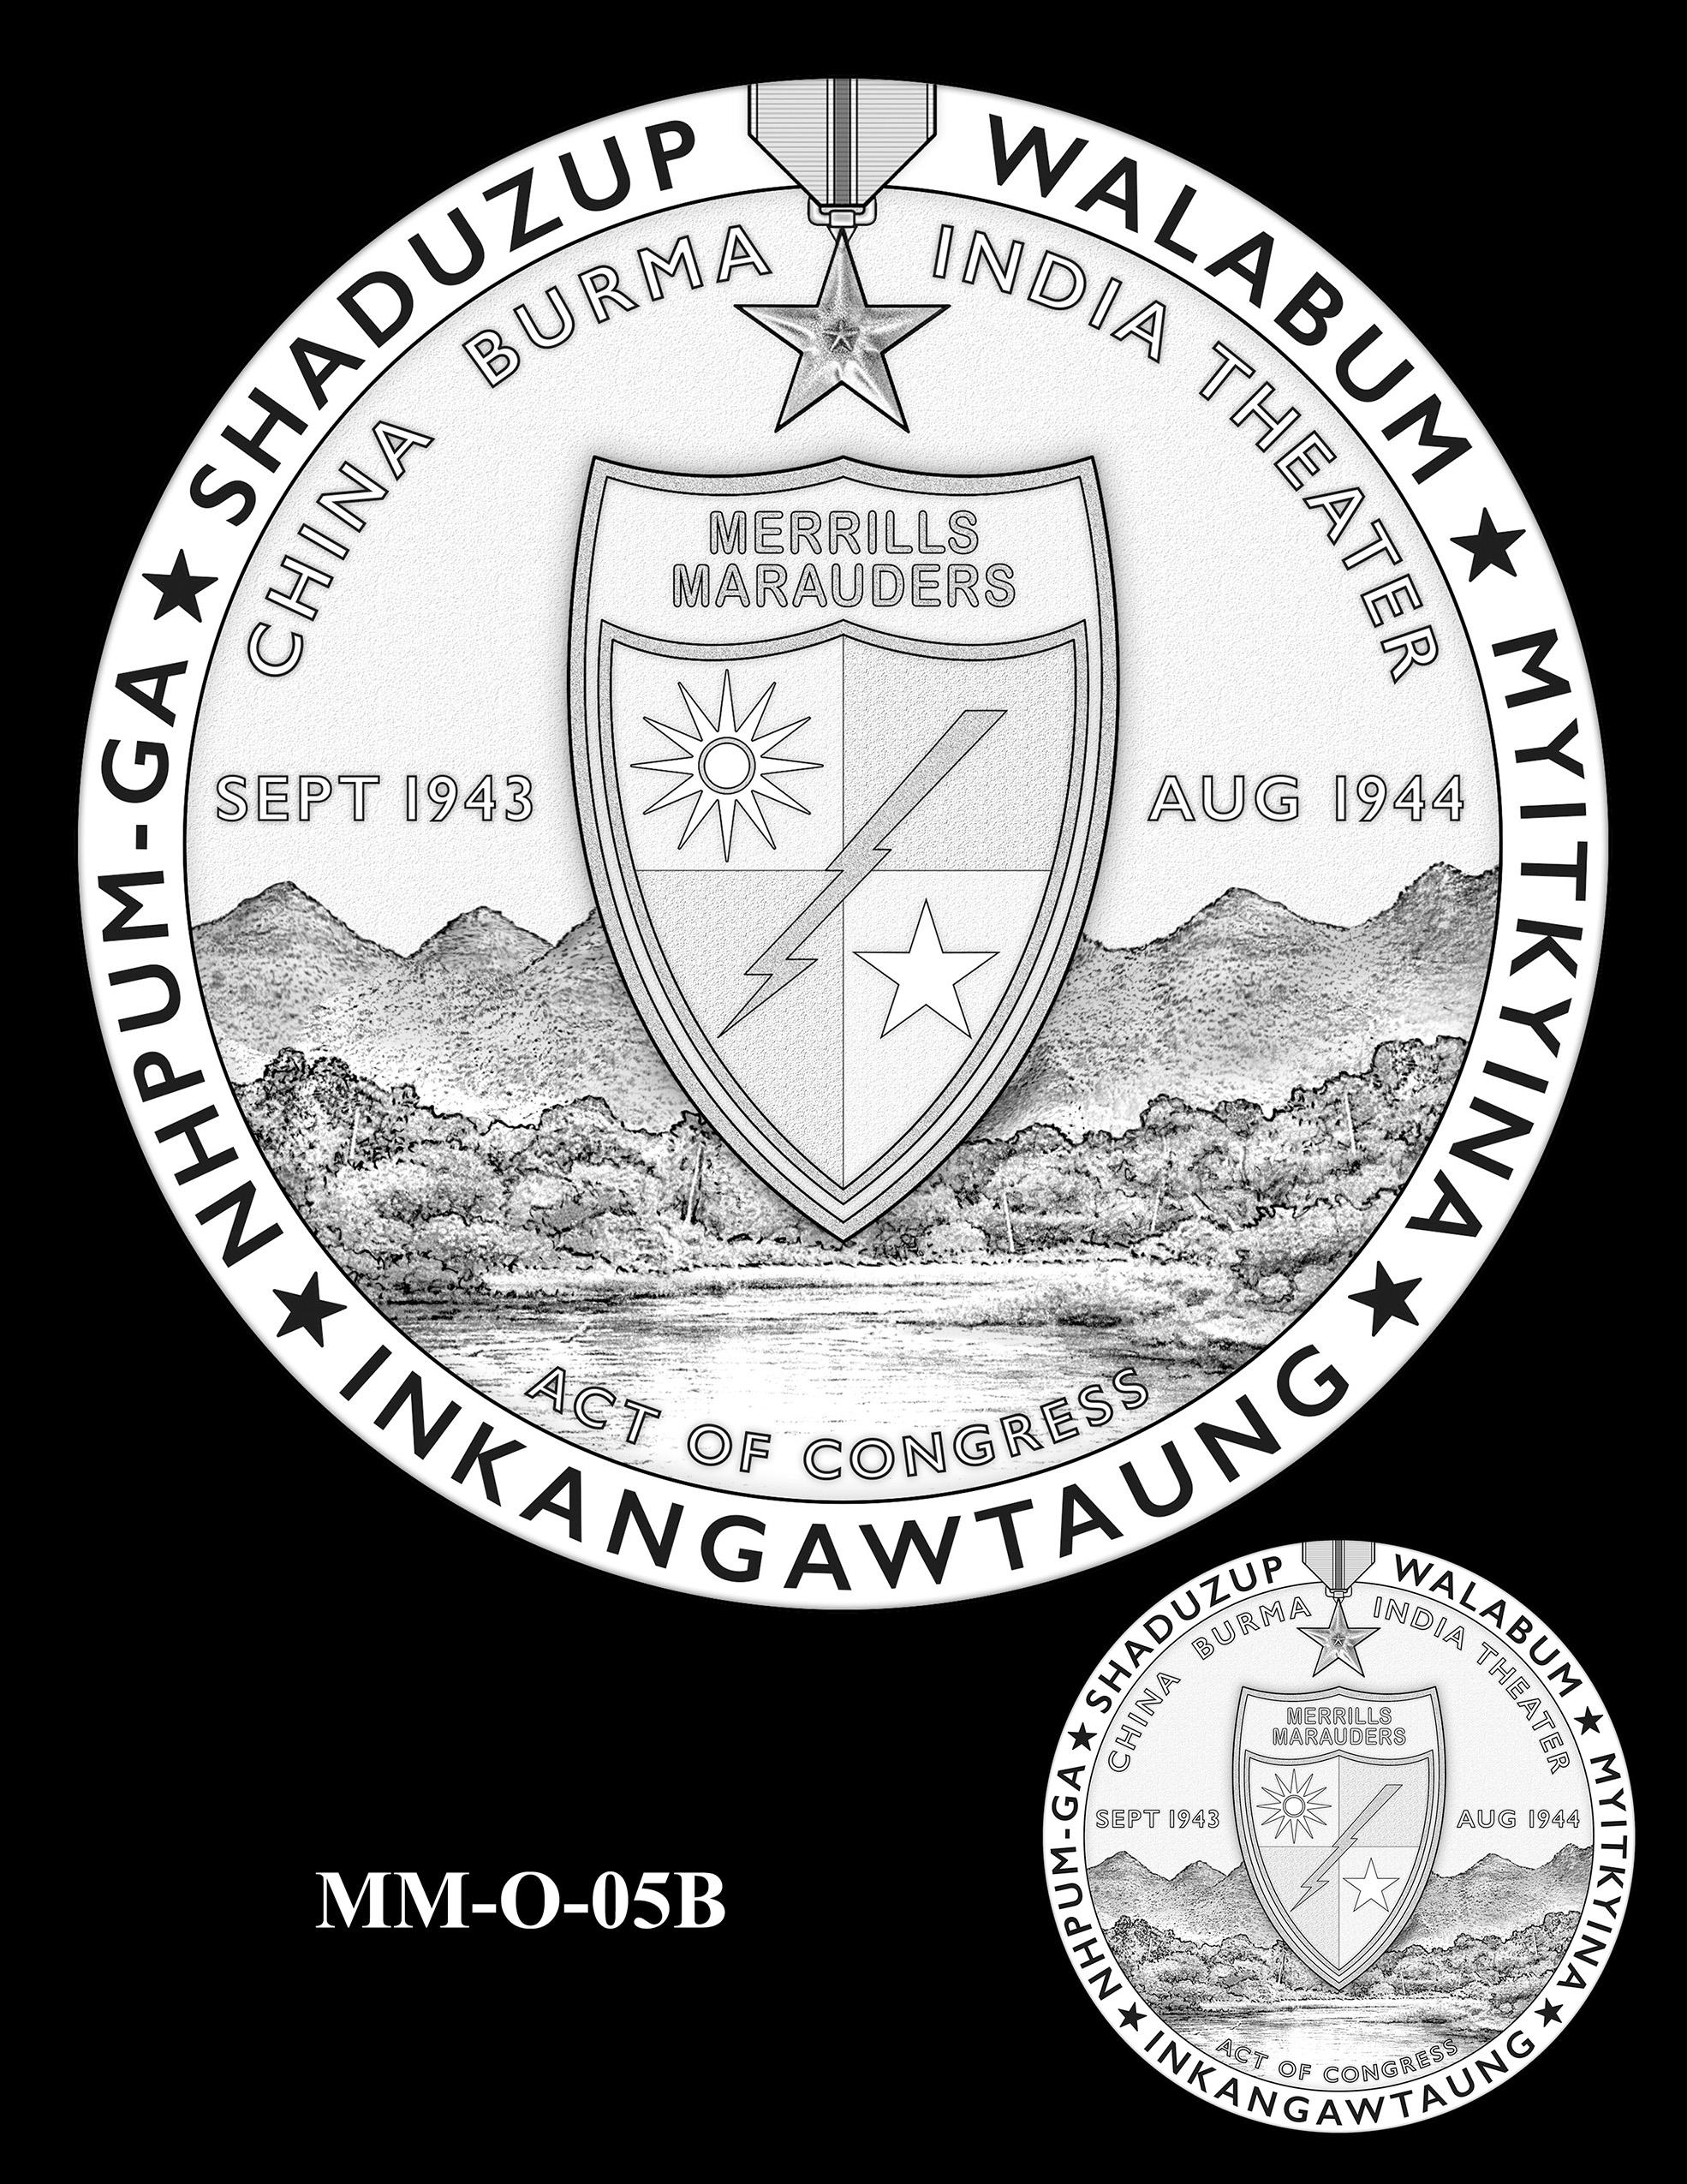 MM-O-05B -- Merrill's Marauders Congressional Gold Medal